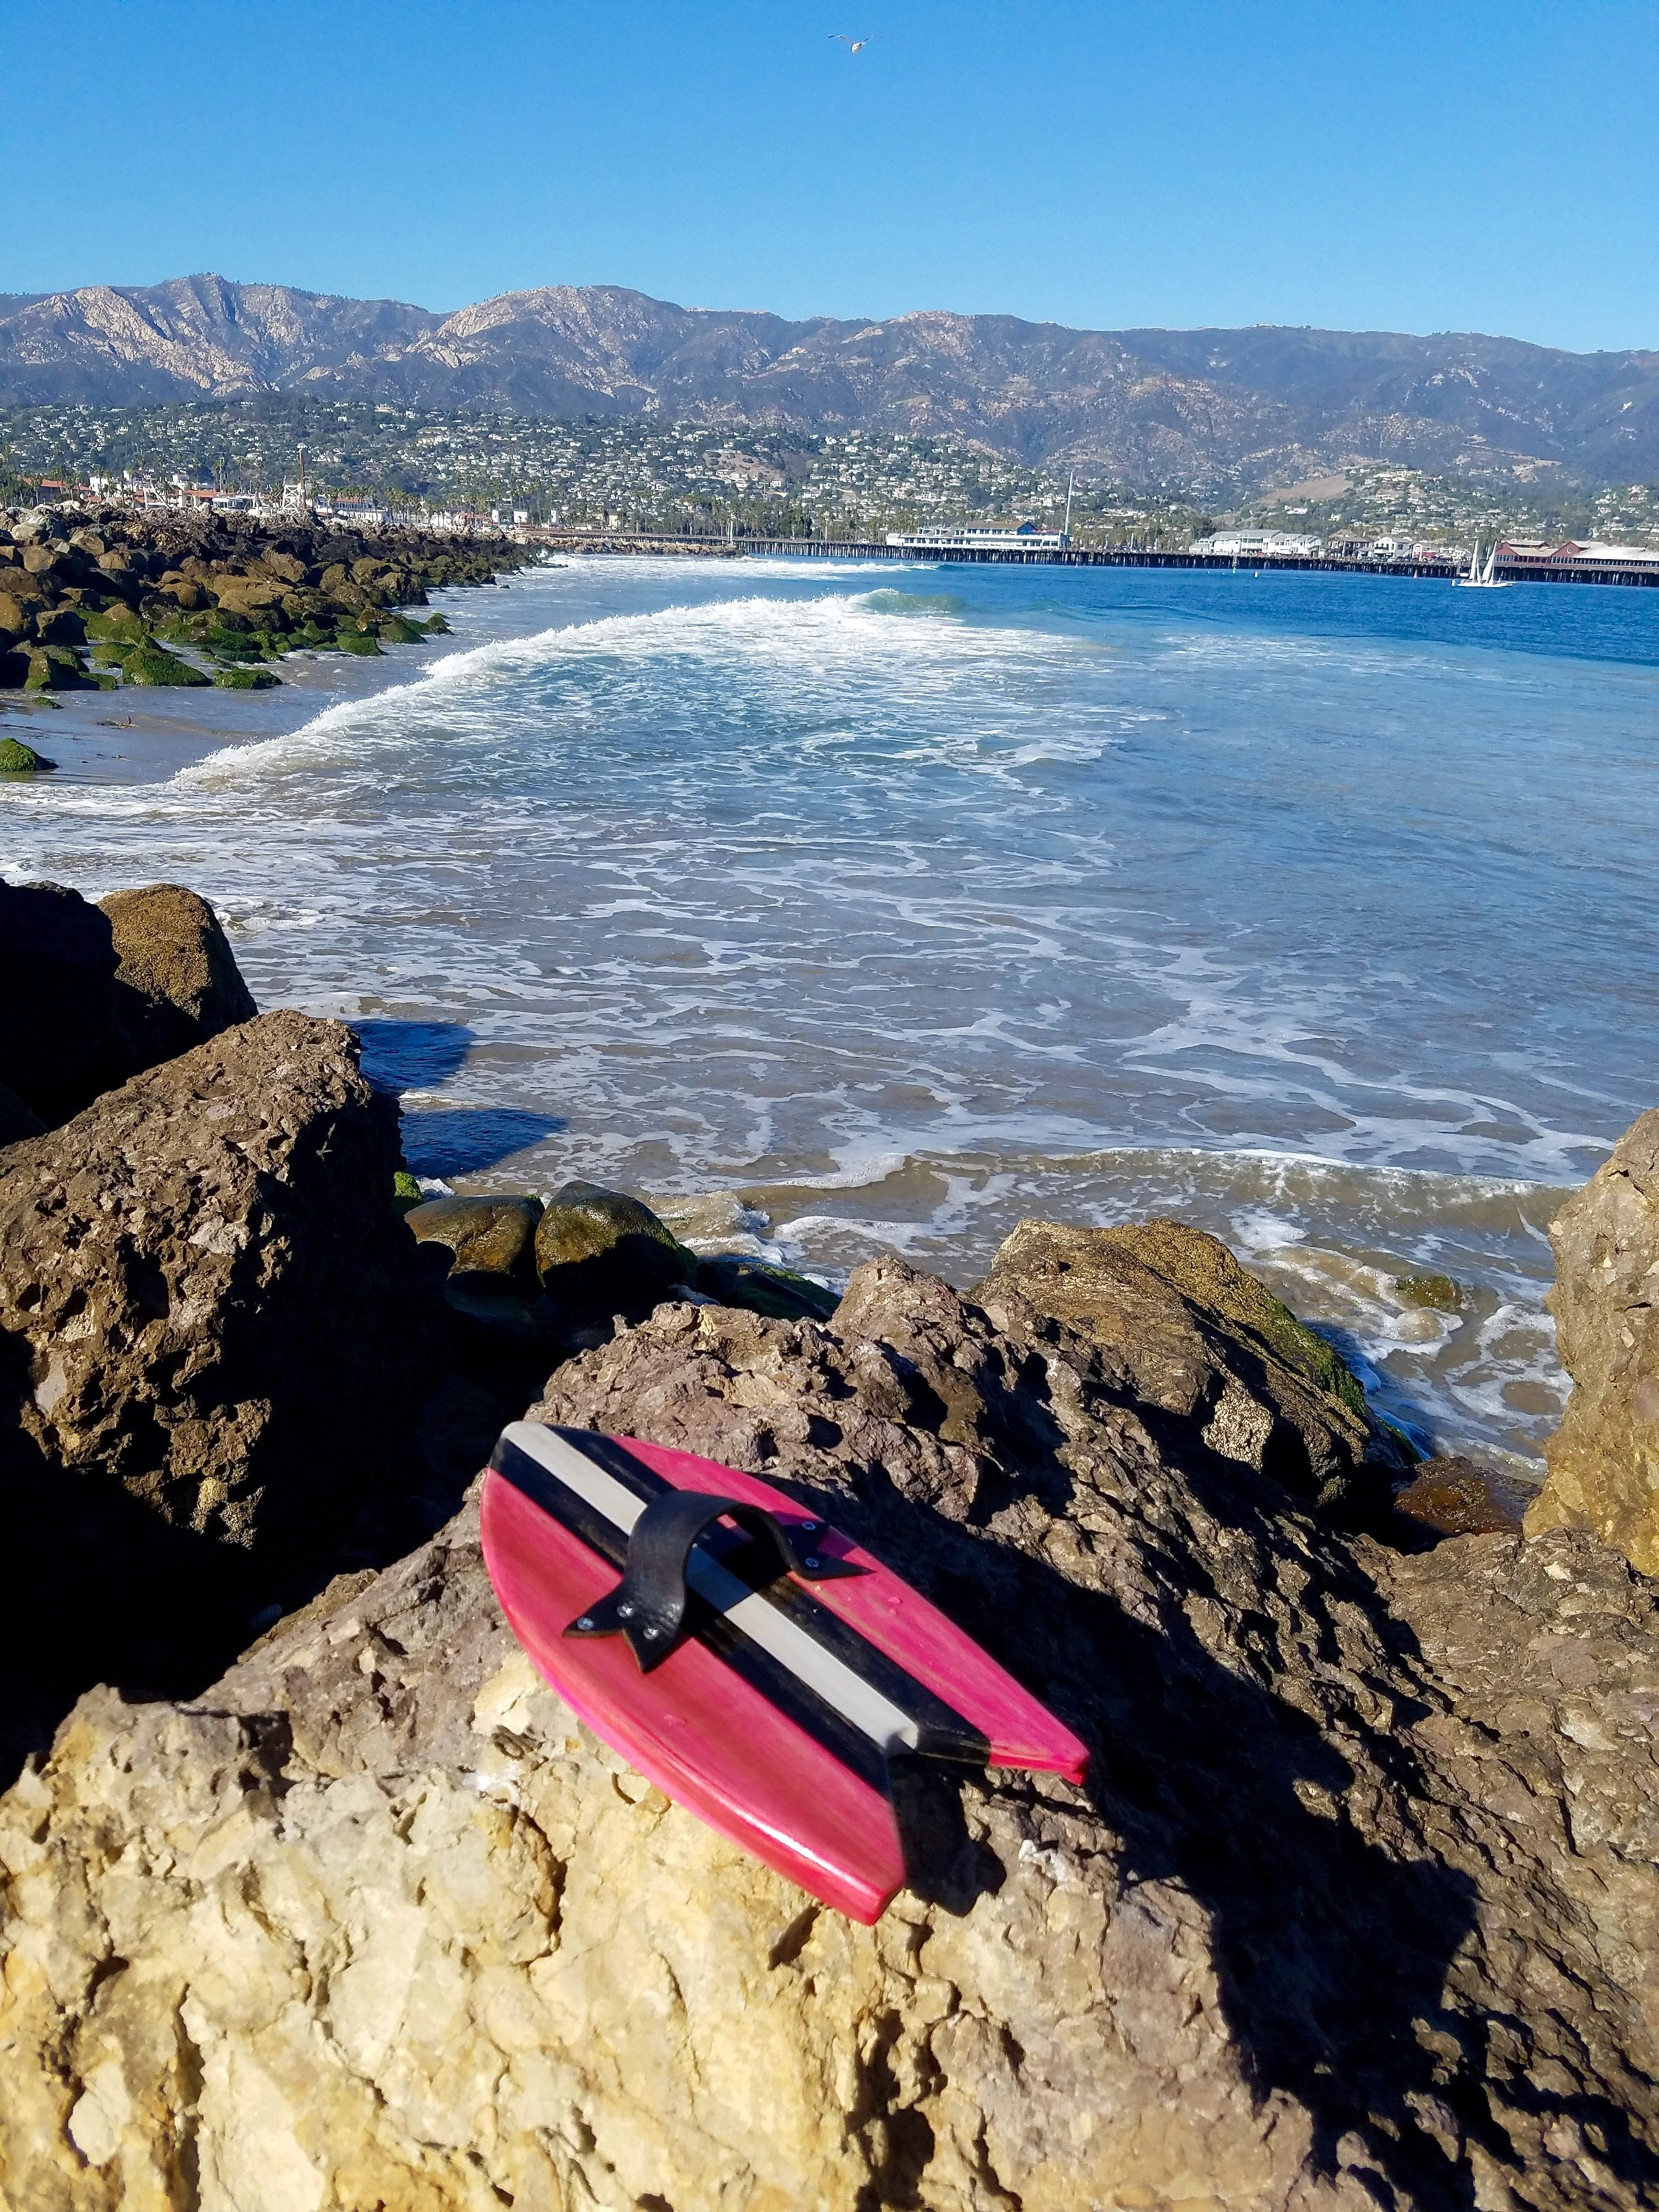 Santa Barbara Harbor - Sandspit surf break. Handcrafted Handplanes ...